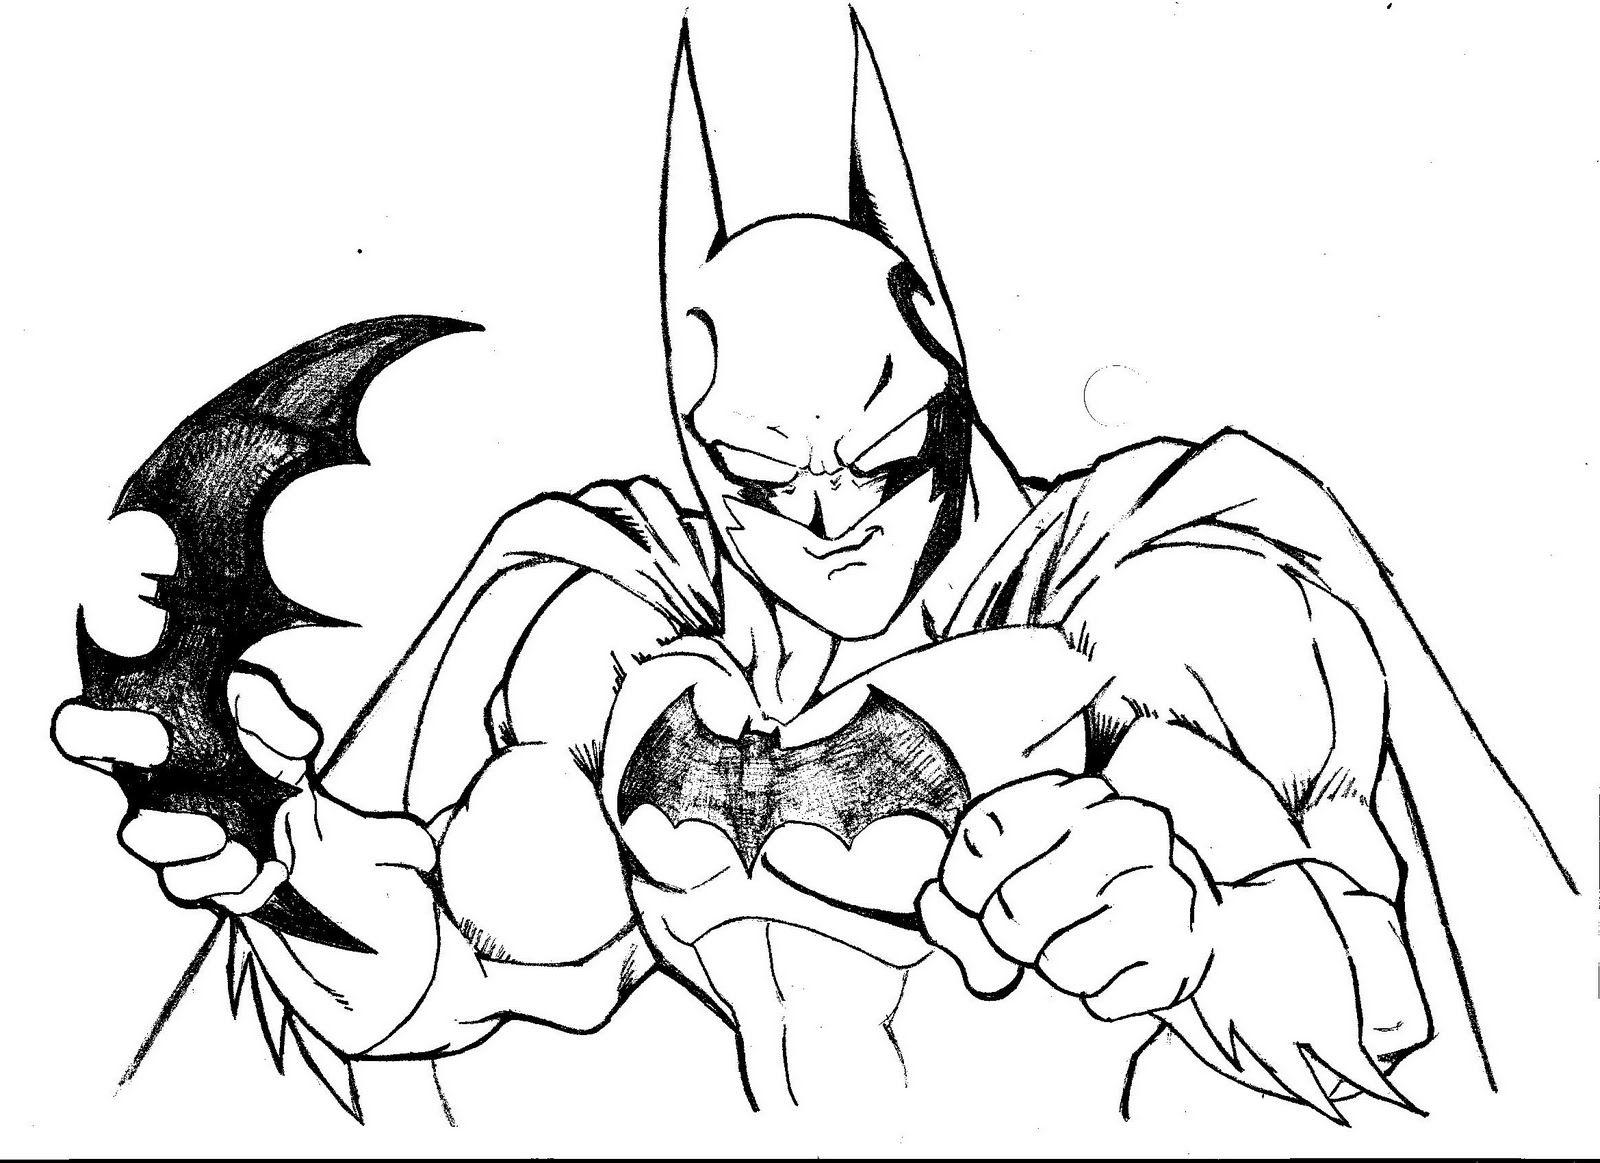 batman and flash comic drawings   si Toriyama dibujara a Batman - Fan-Art - Dibujo - DC